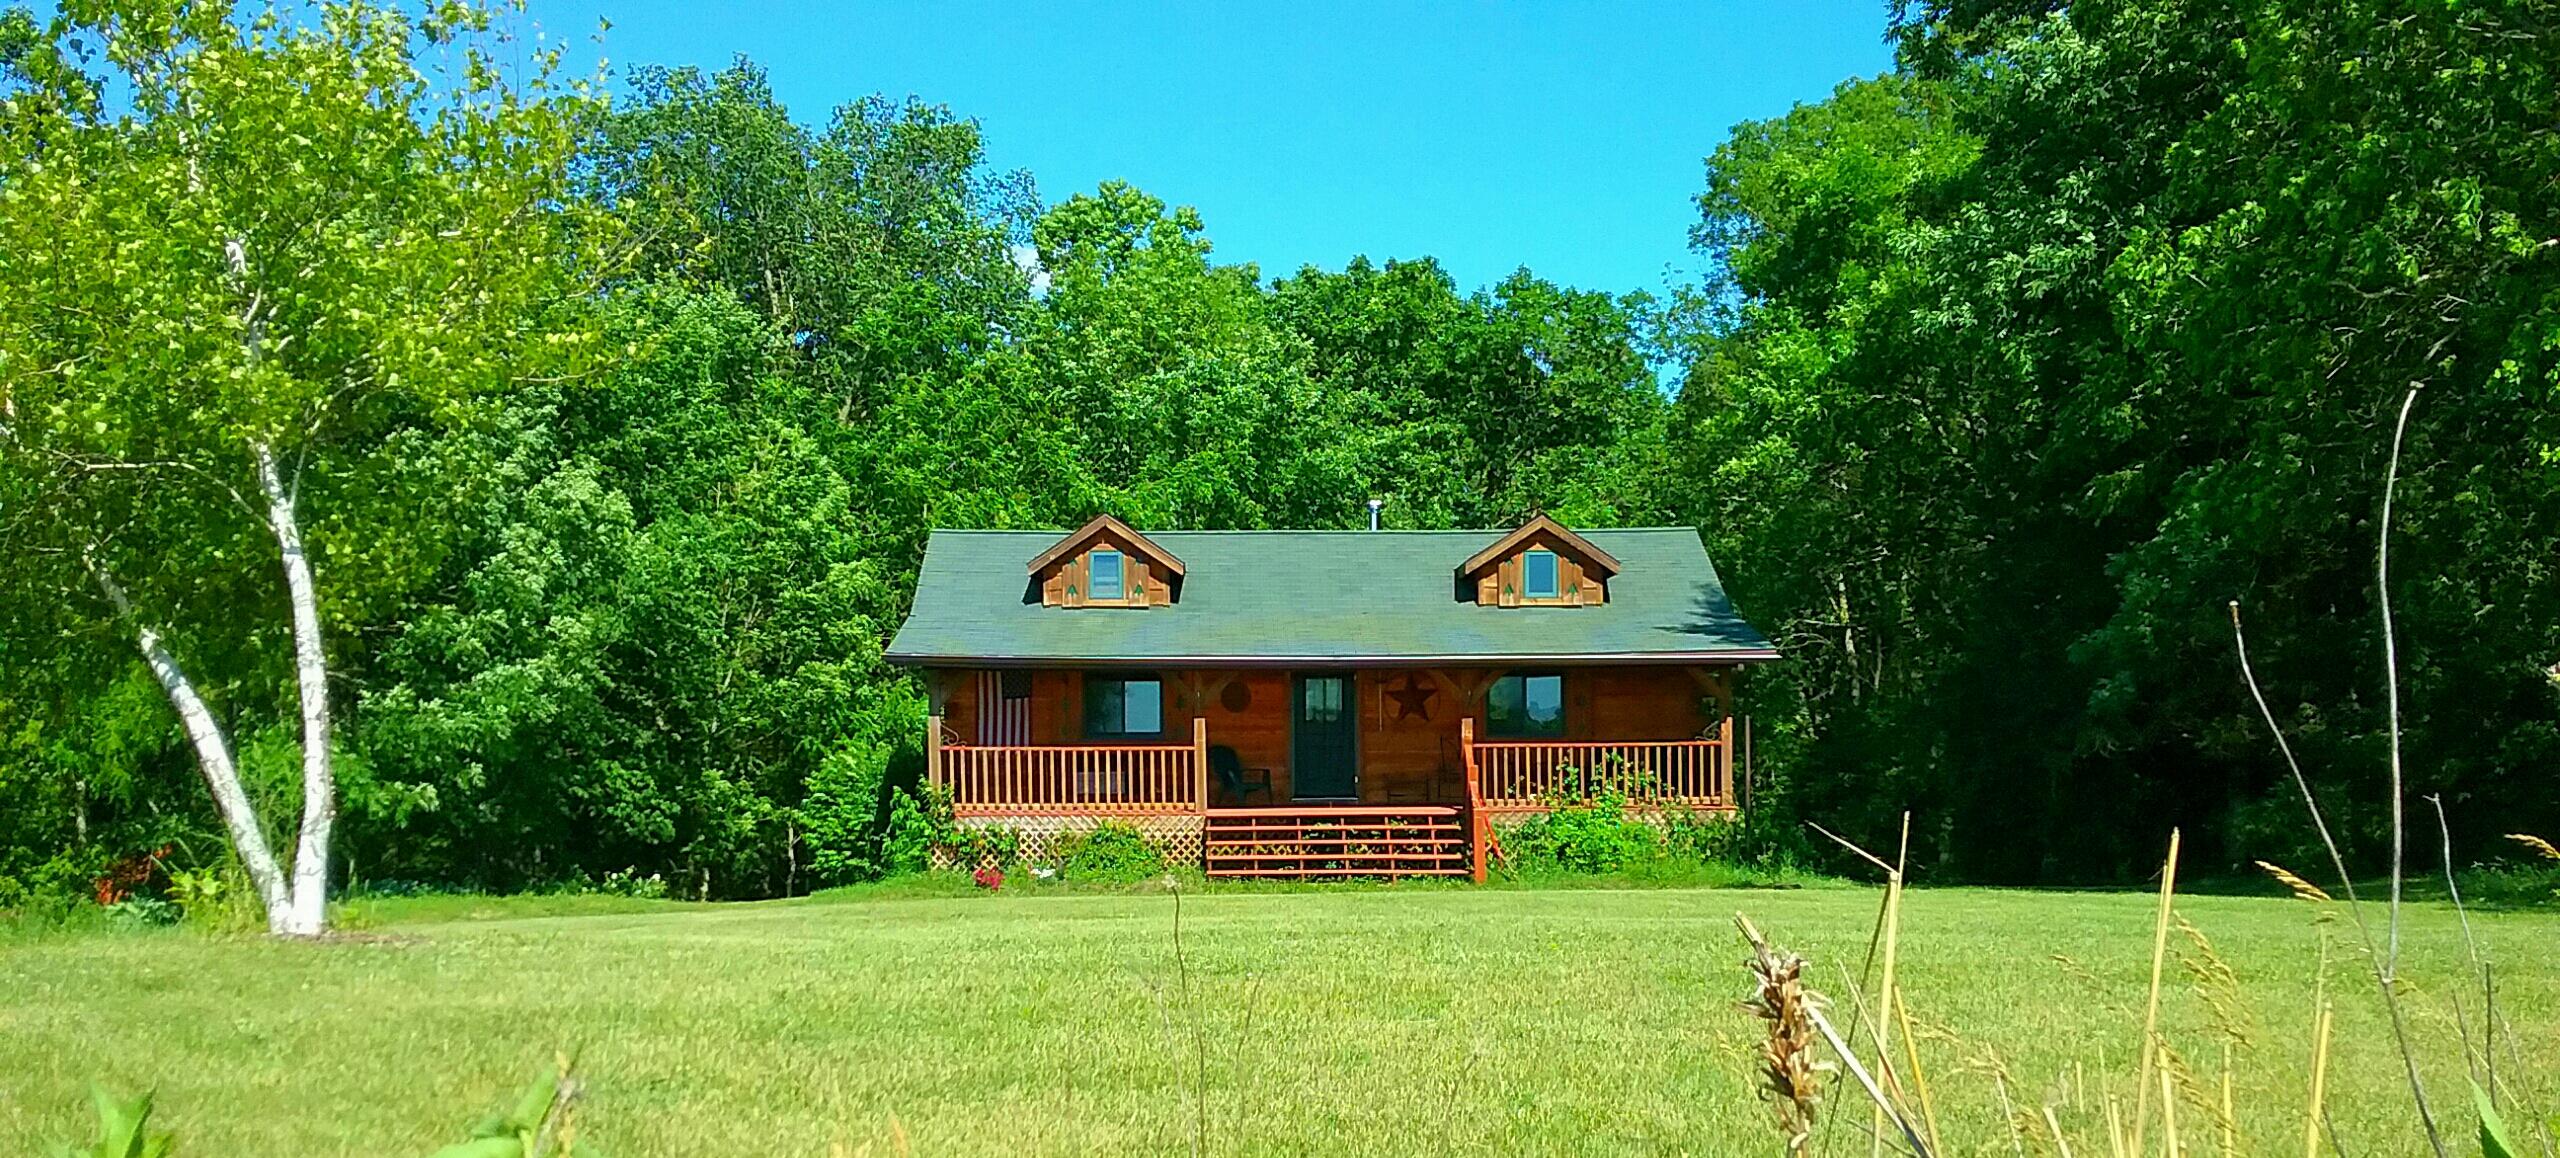 chestnut hill 2 bedroom log cabin